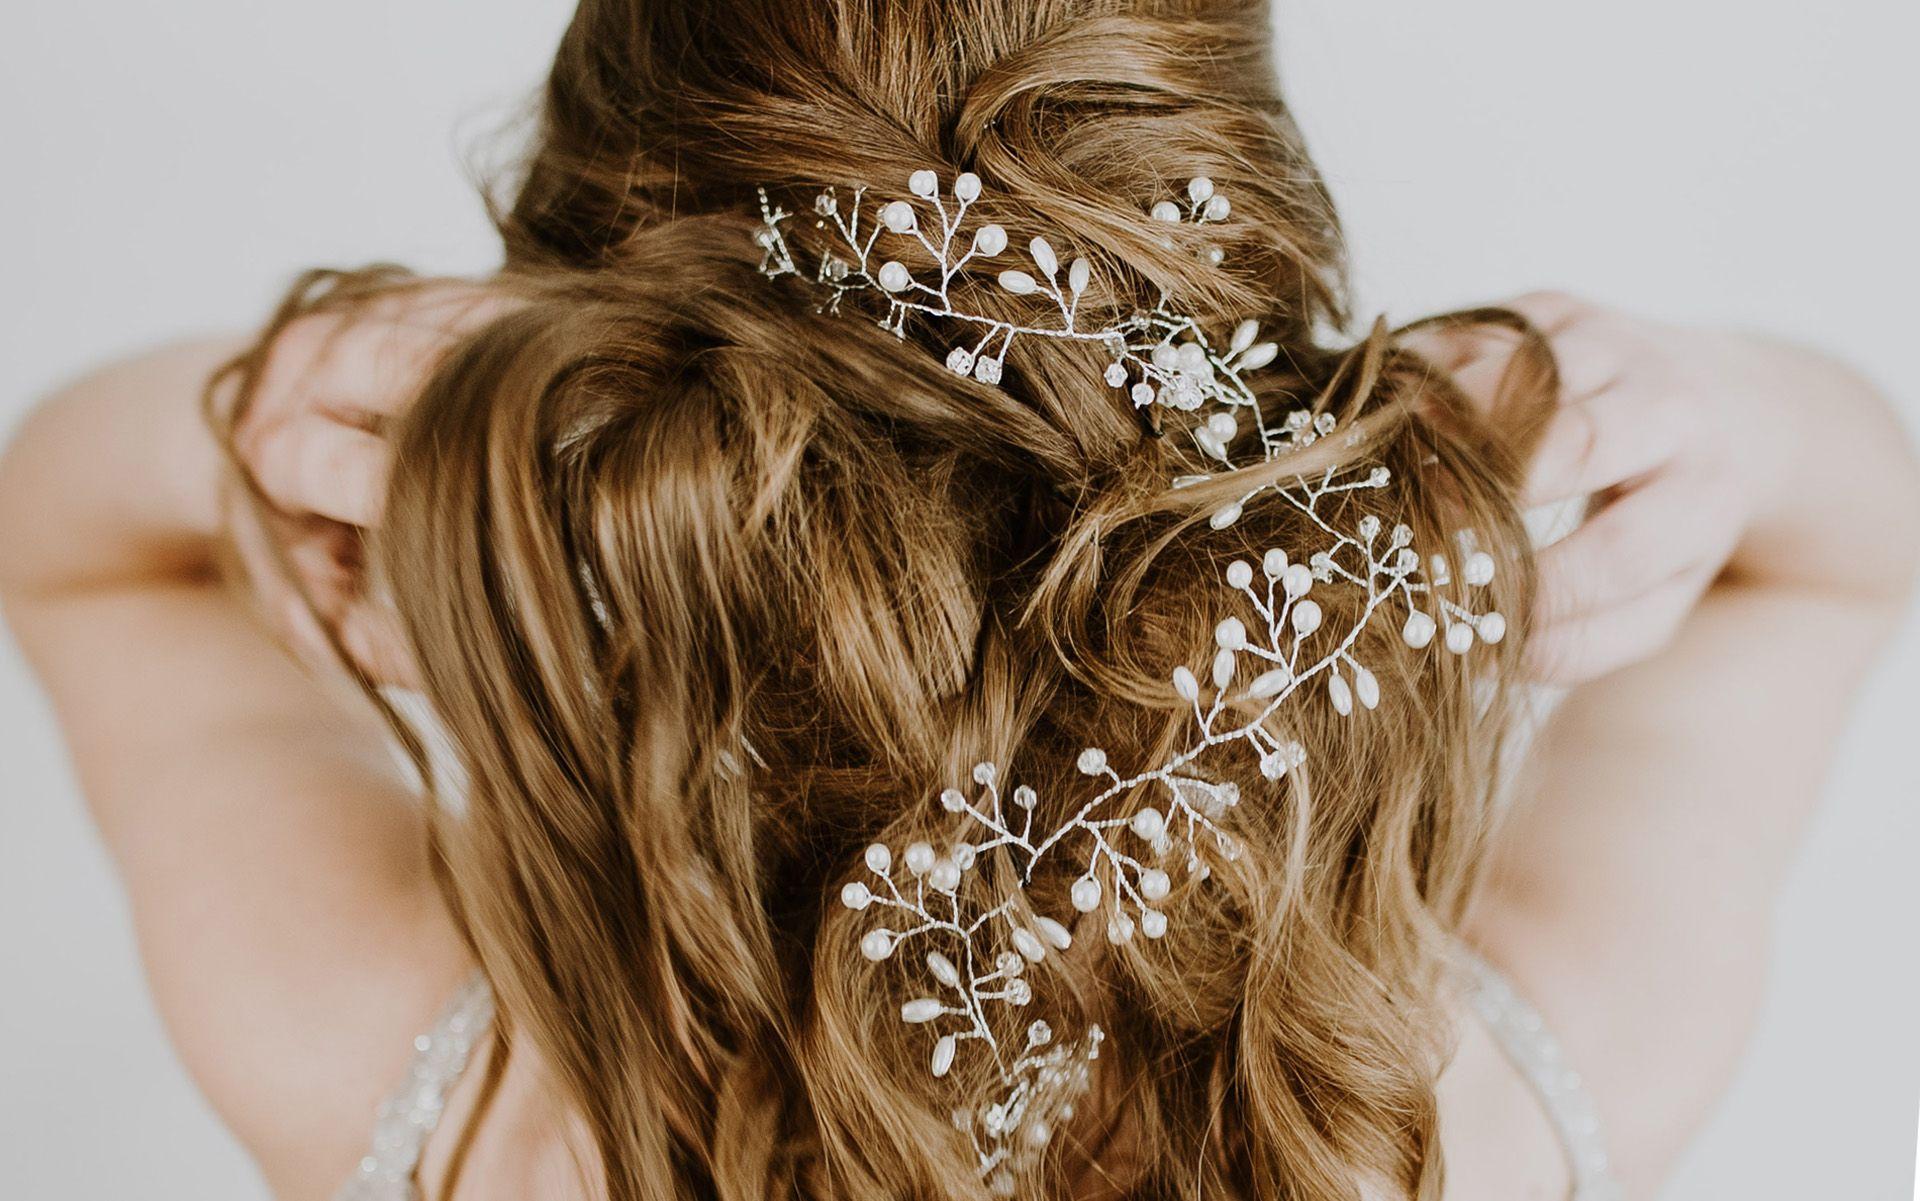 Hair accessory wedding trend